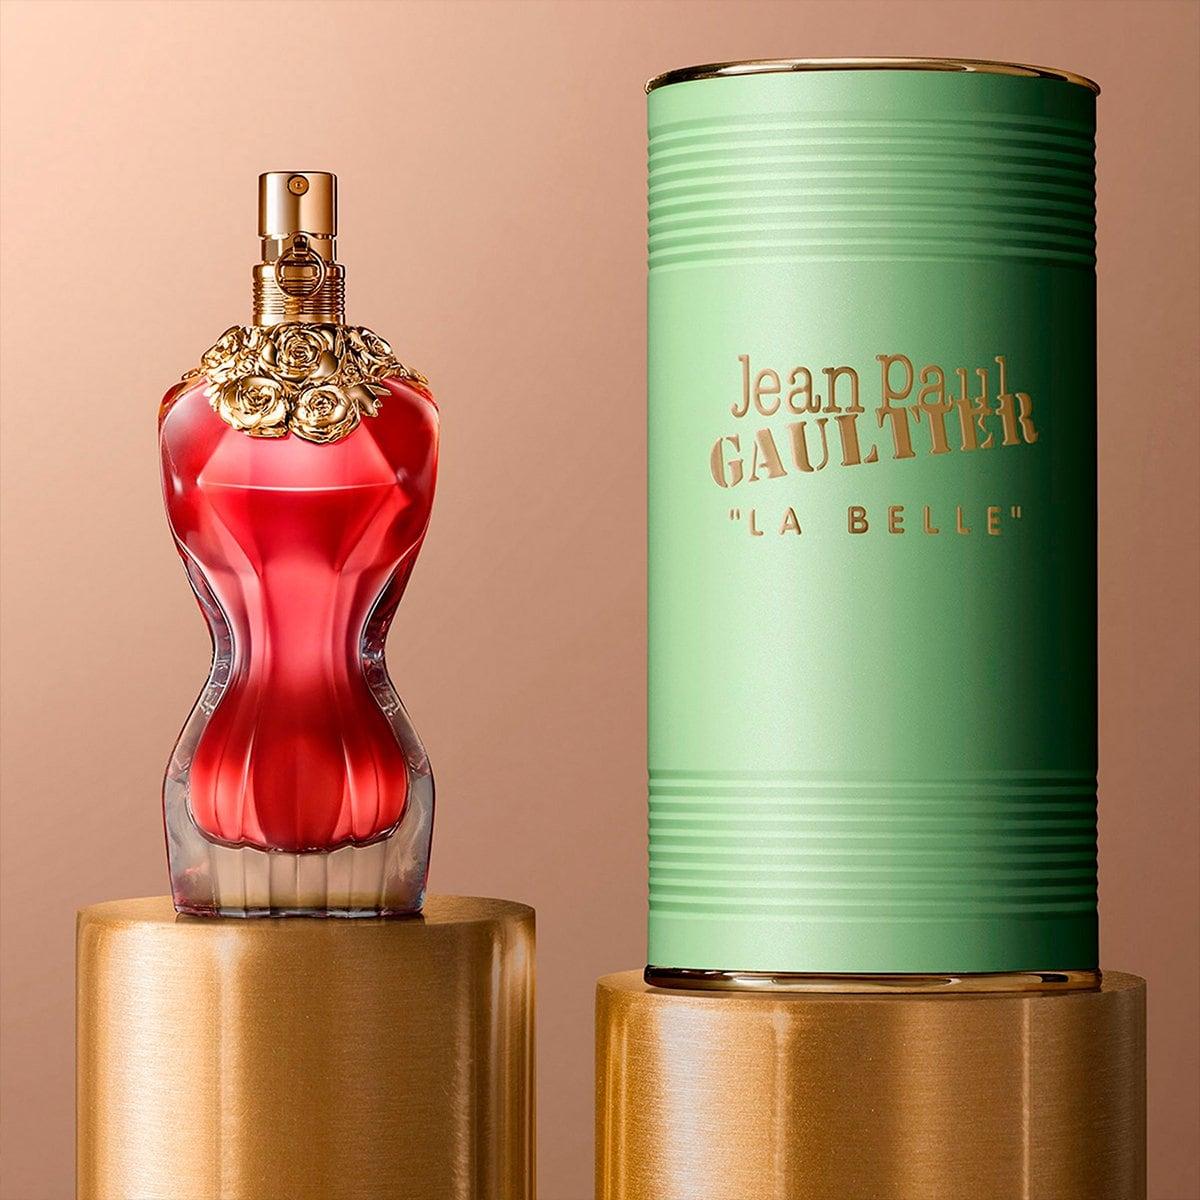 Estuche para Dama Jean Paul Gaultier Le Belle Edp 100 Ml + Travel Spray 10 Ml